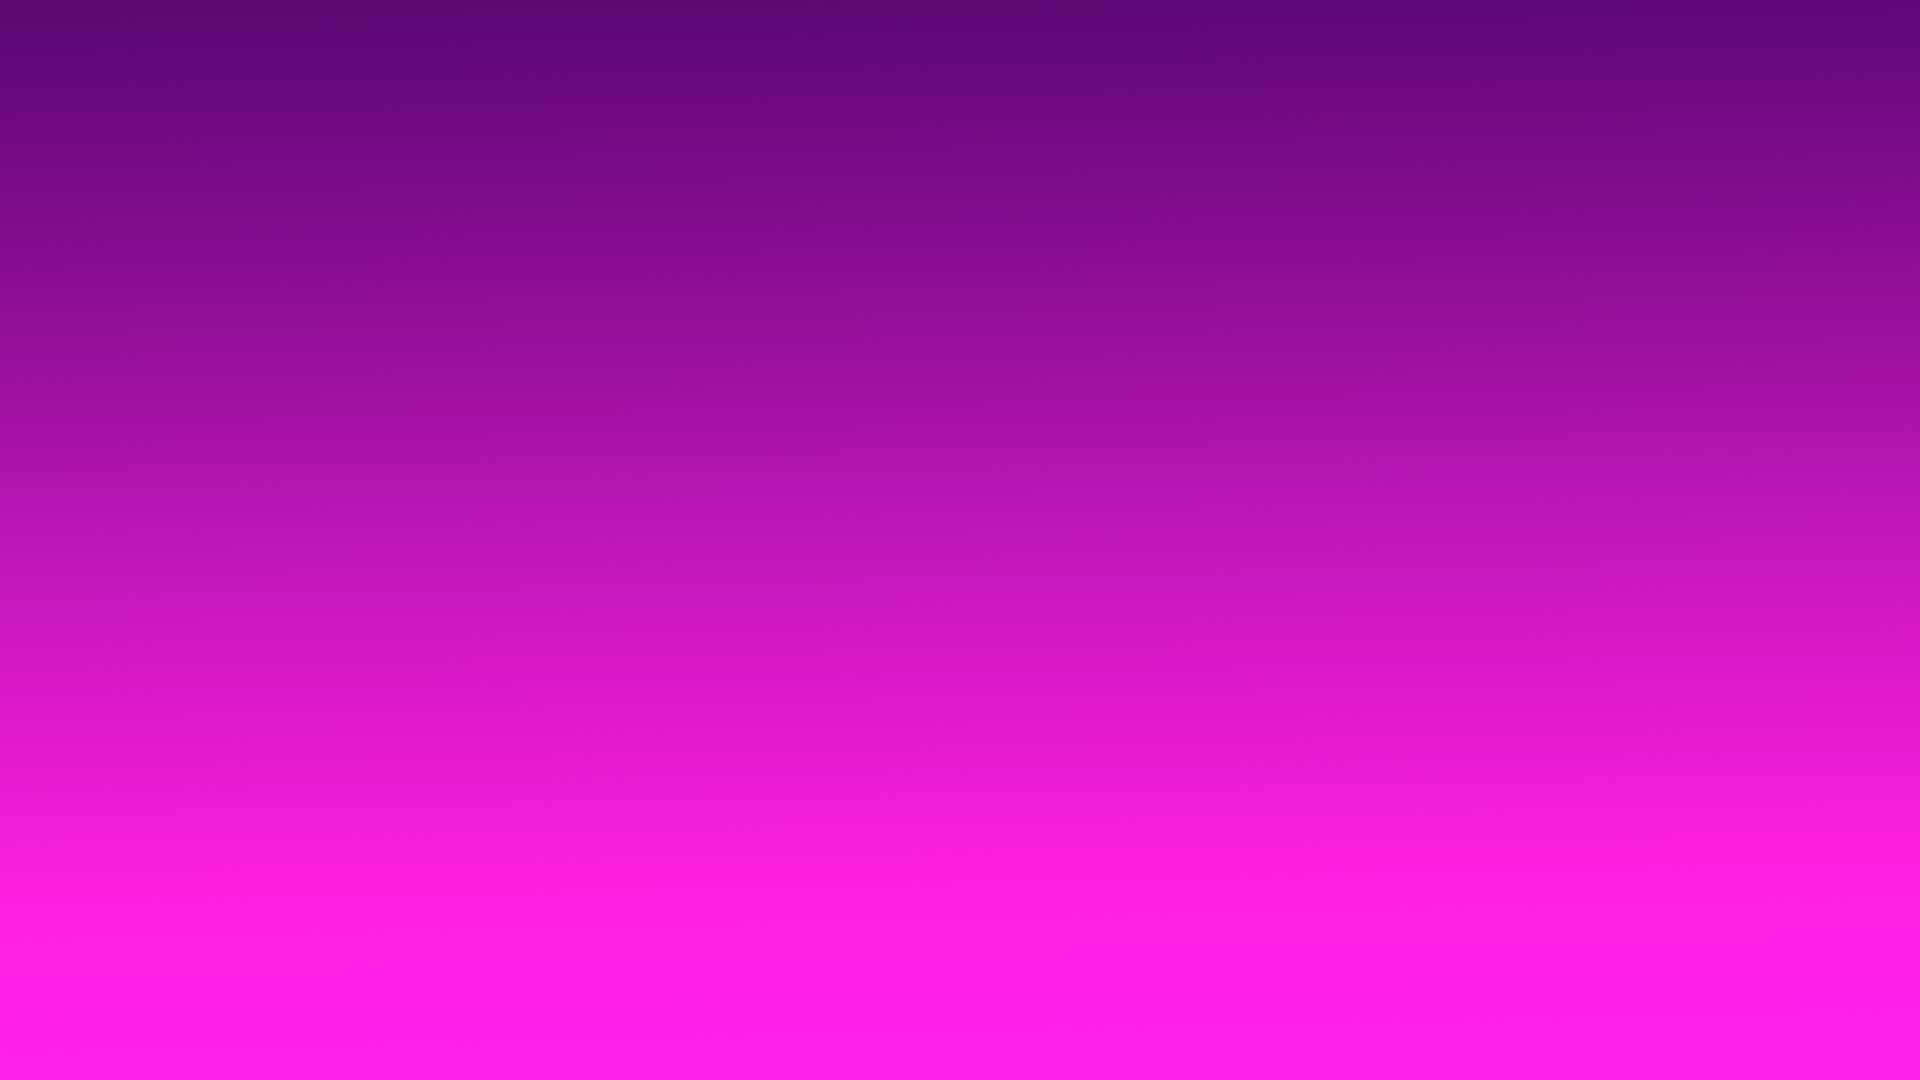 Purple Pink  EZTechTrainingcom